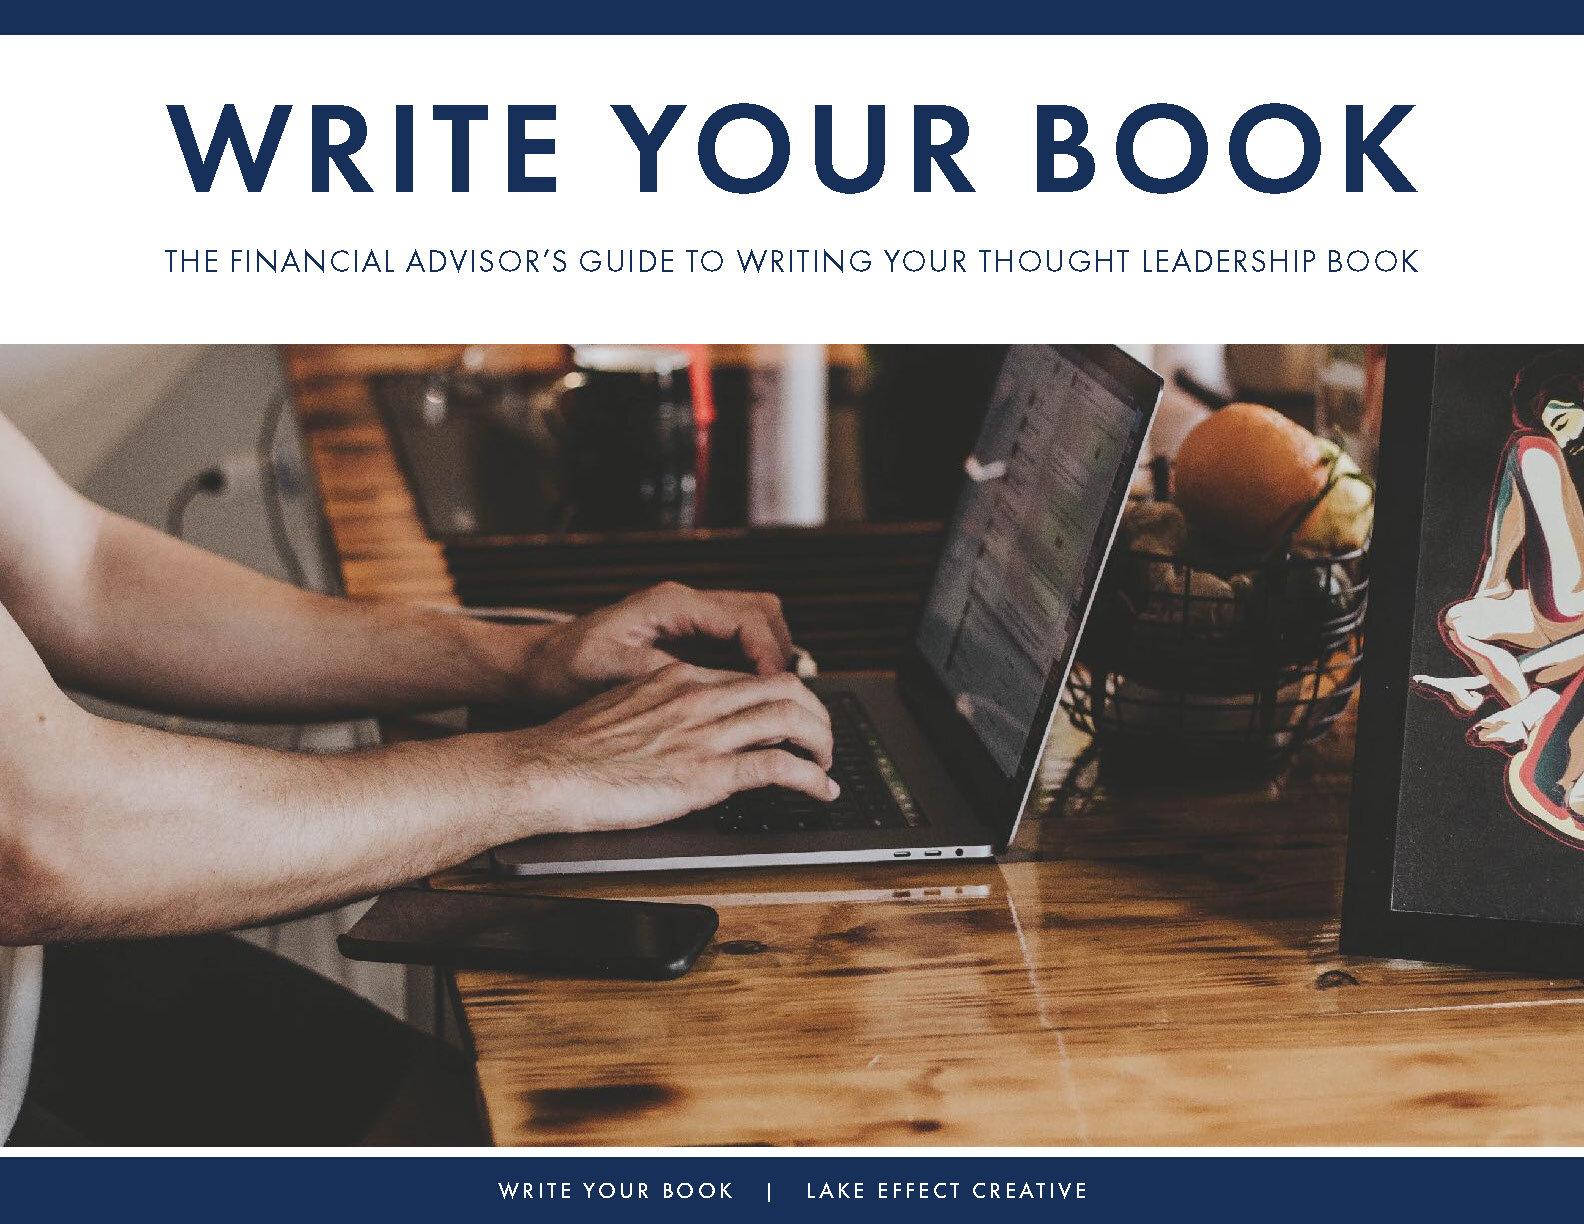 WRITE YOUR BOOK.jpg